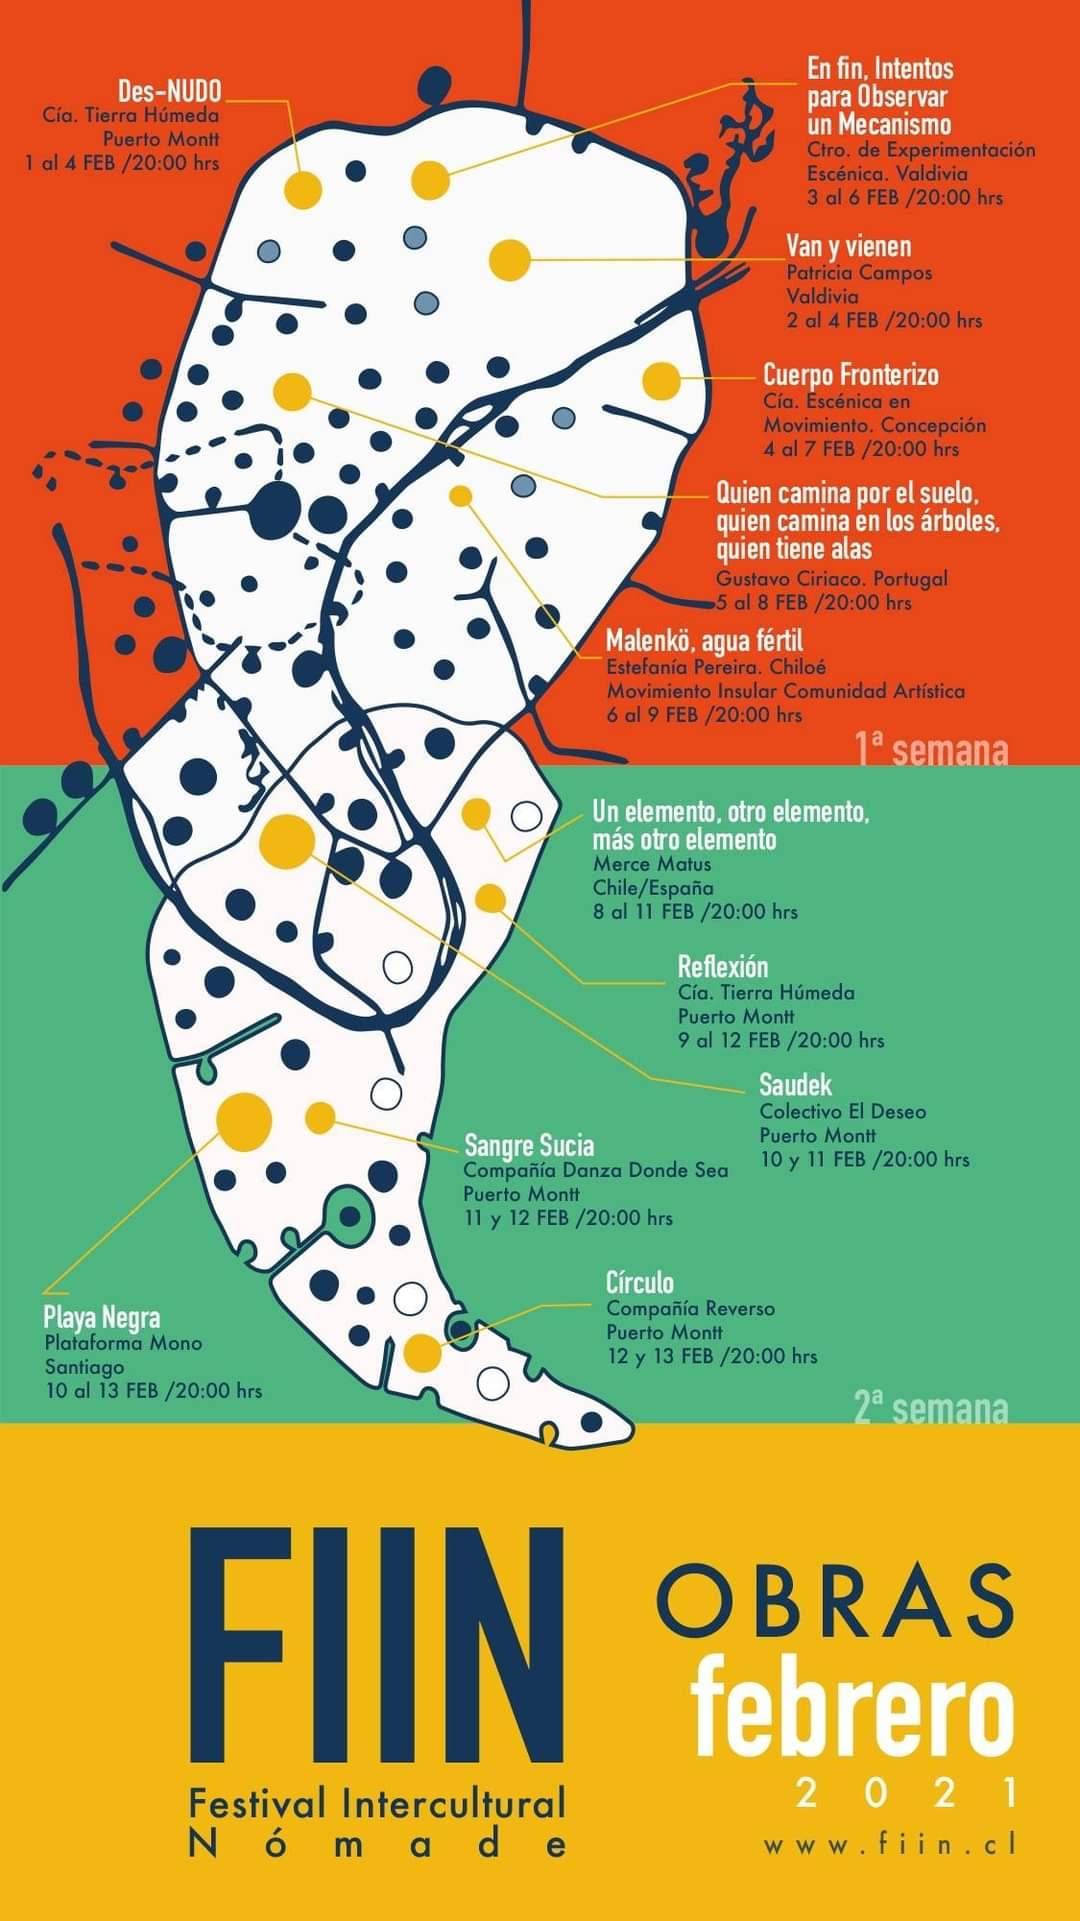 Festival Intercultural Nómade - Online